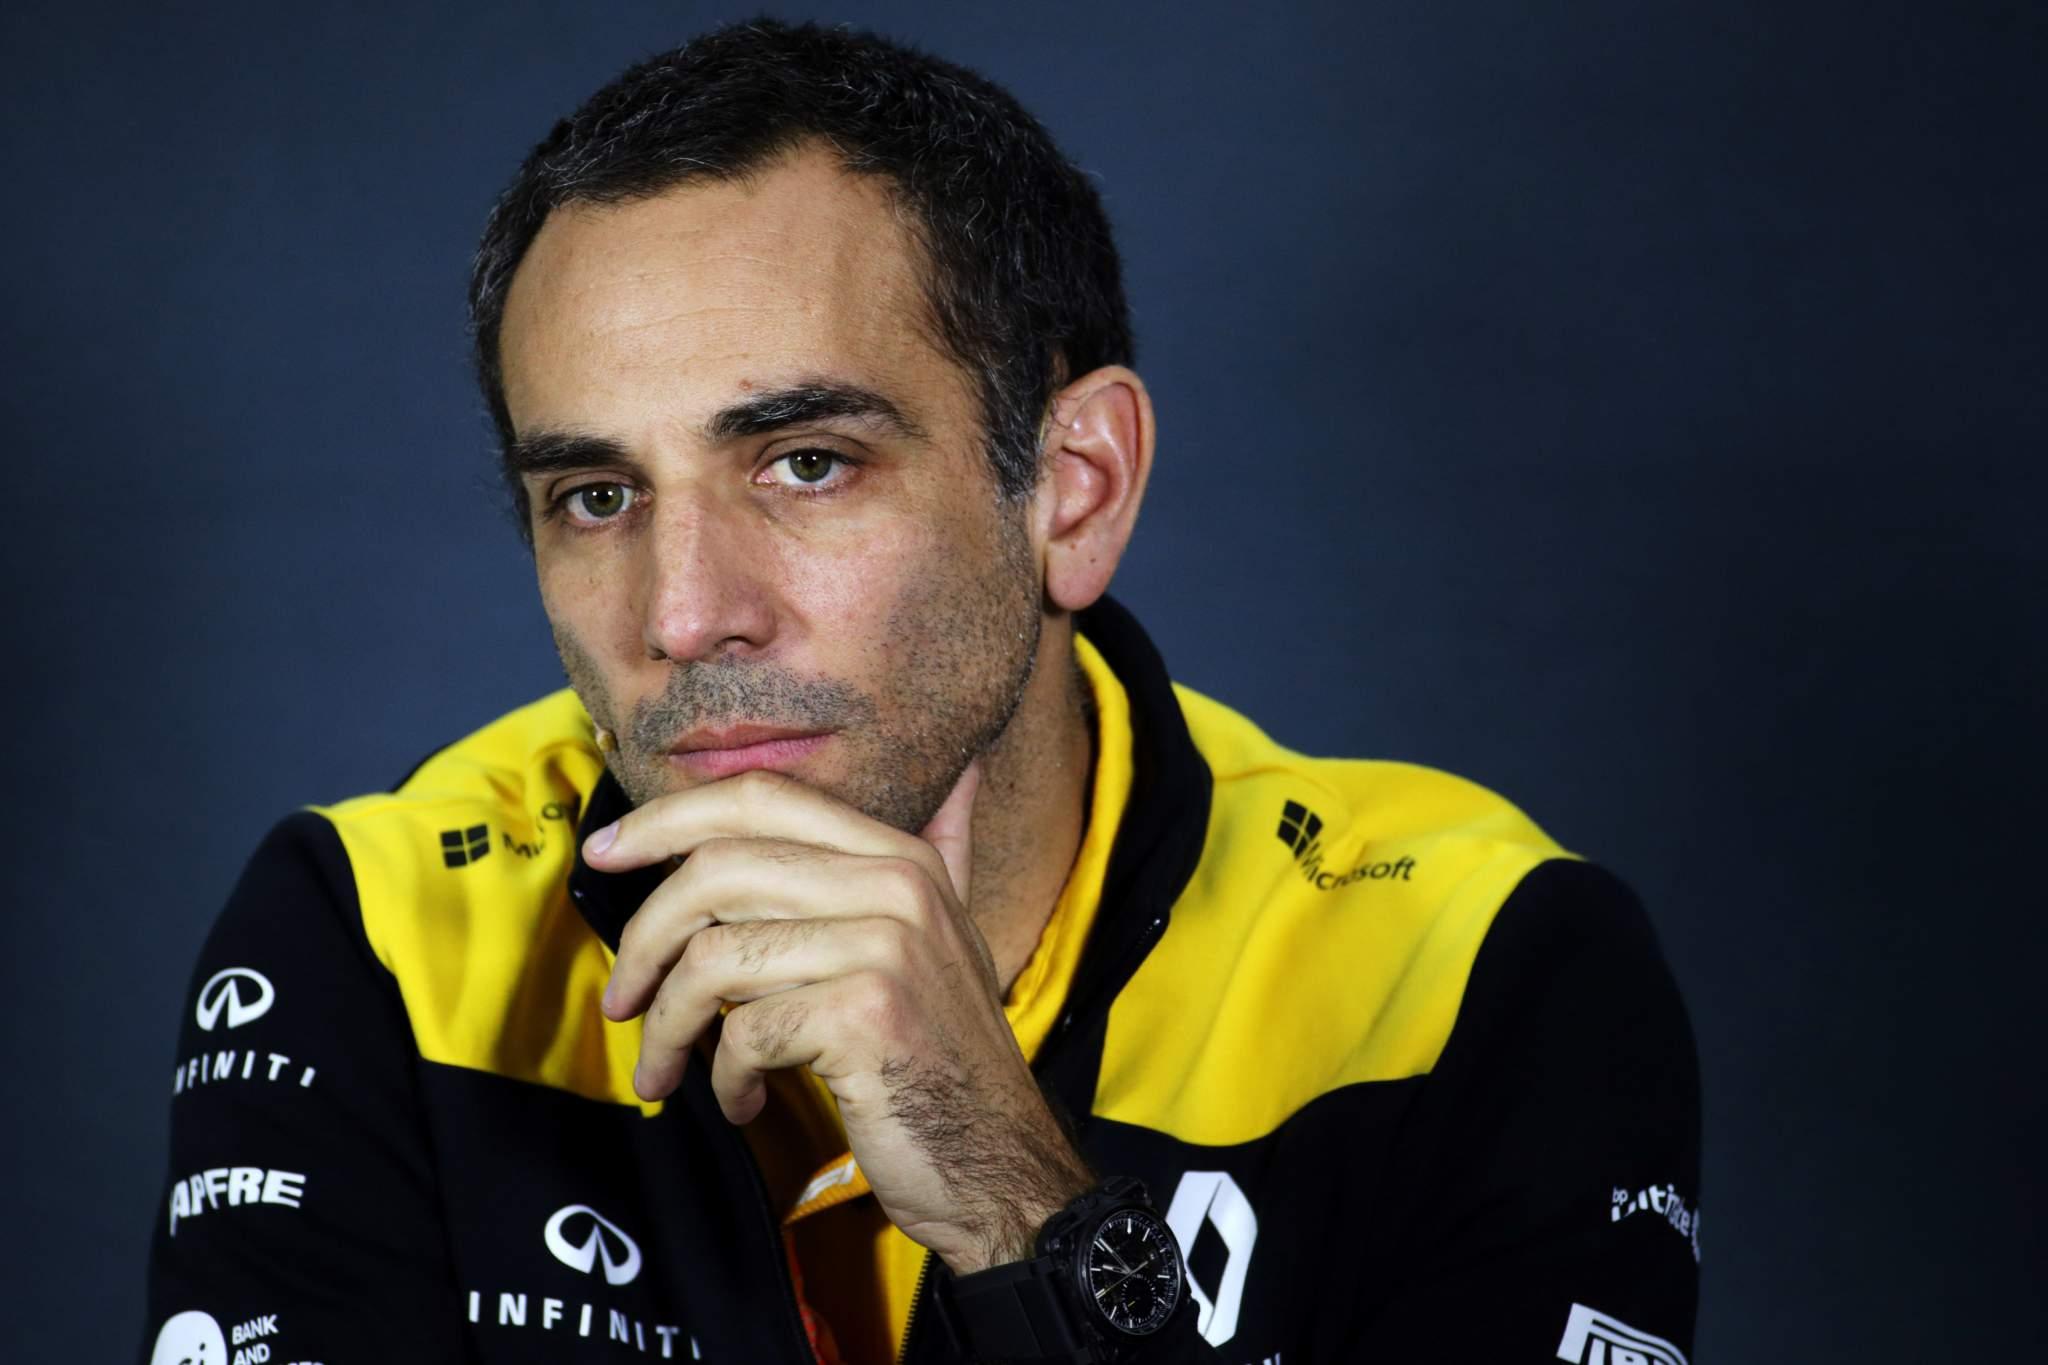 Cyril Abiteboul F1 Renault